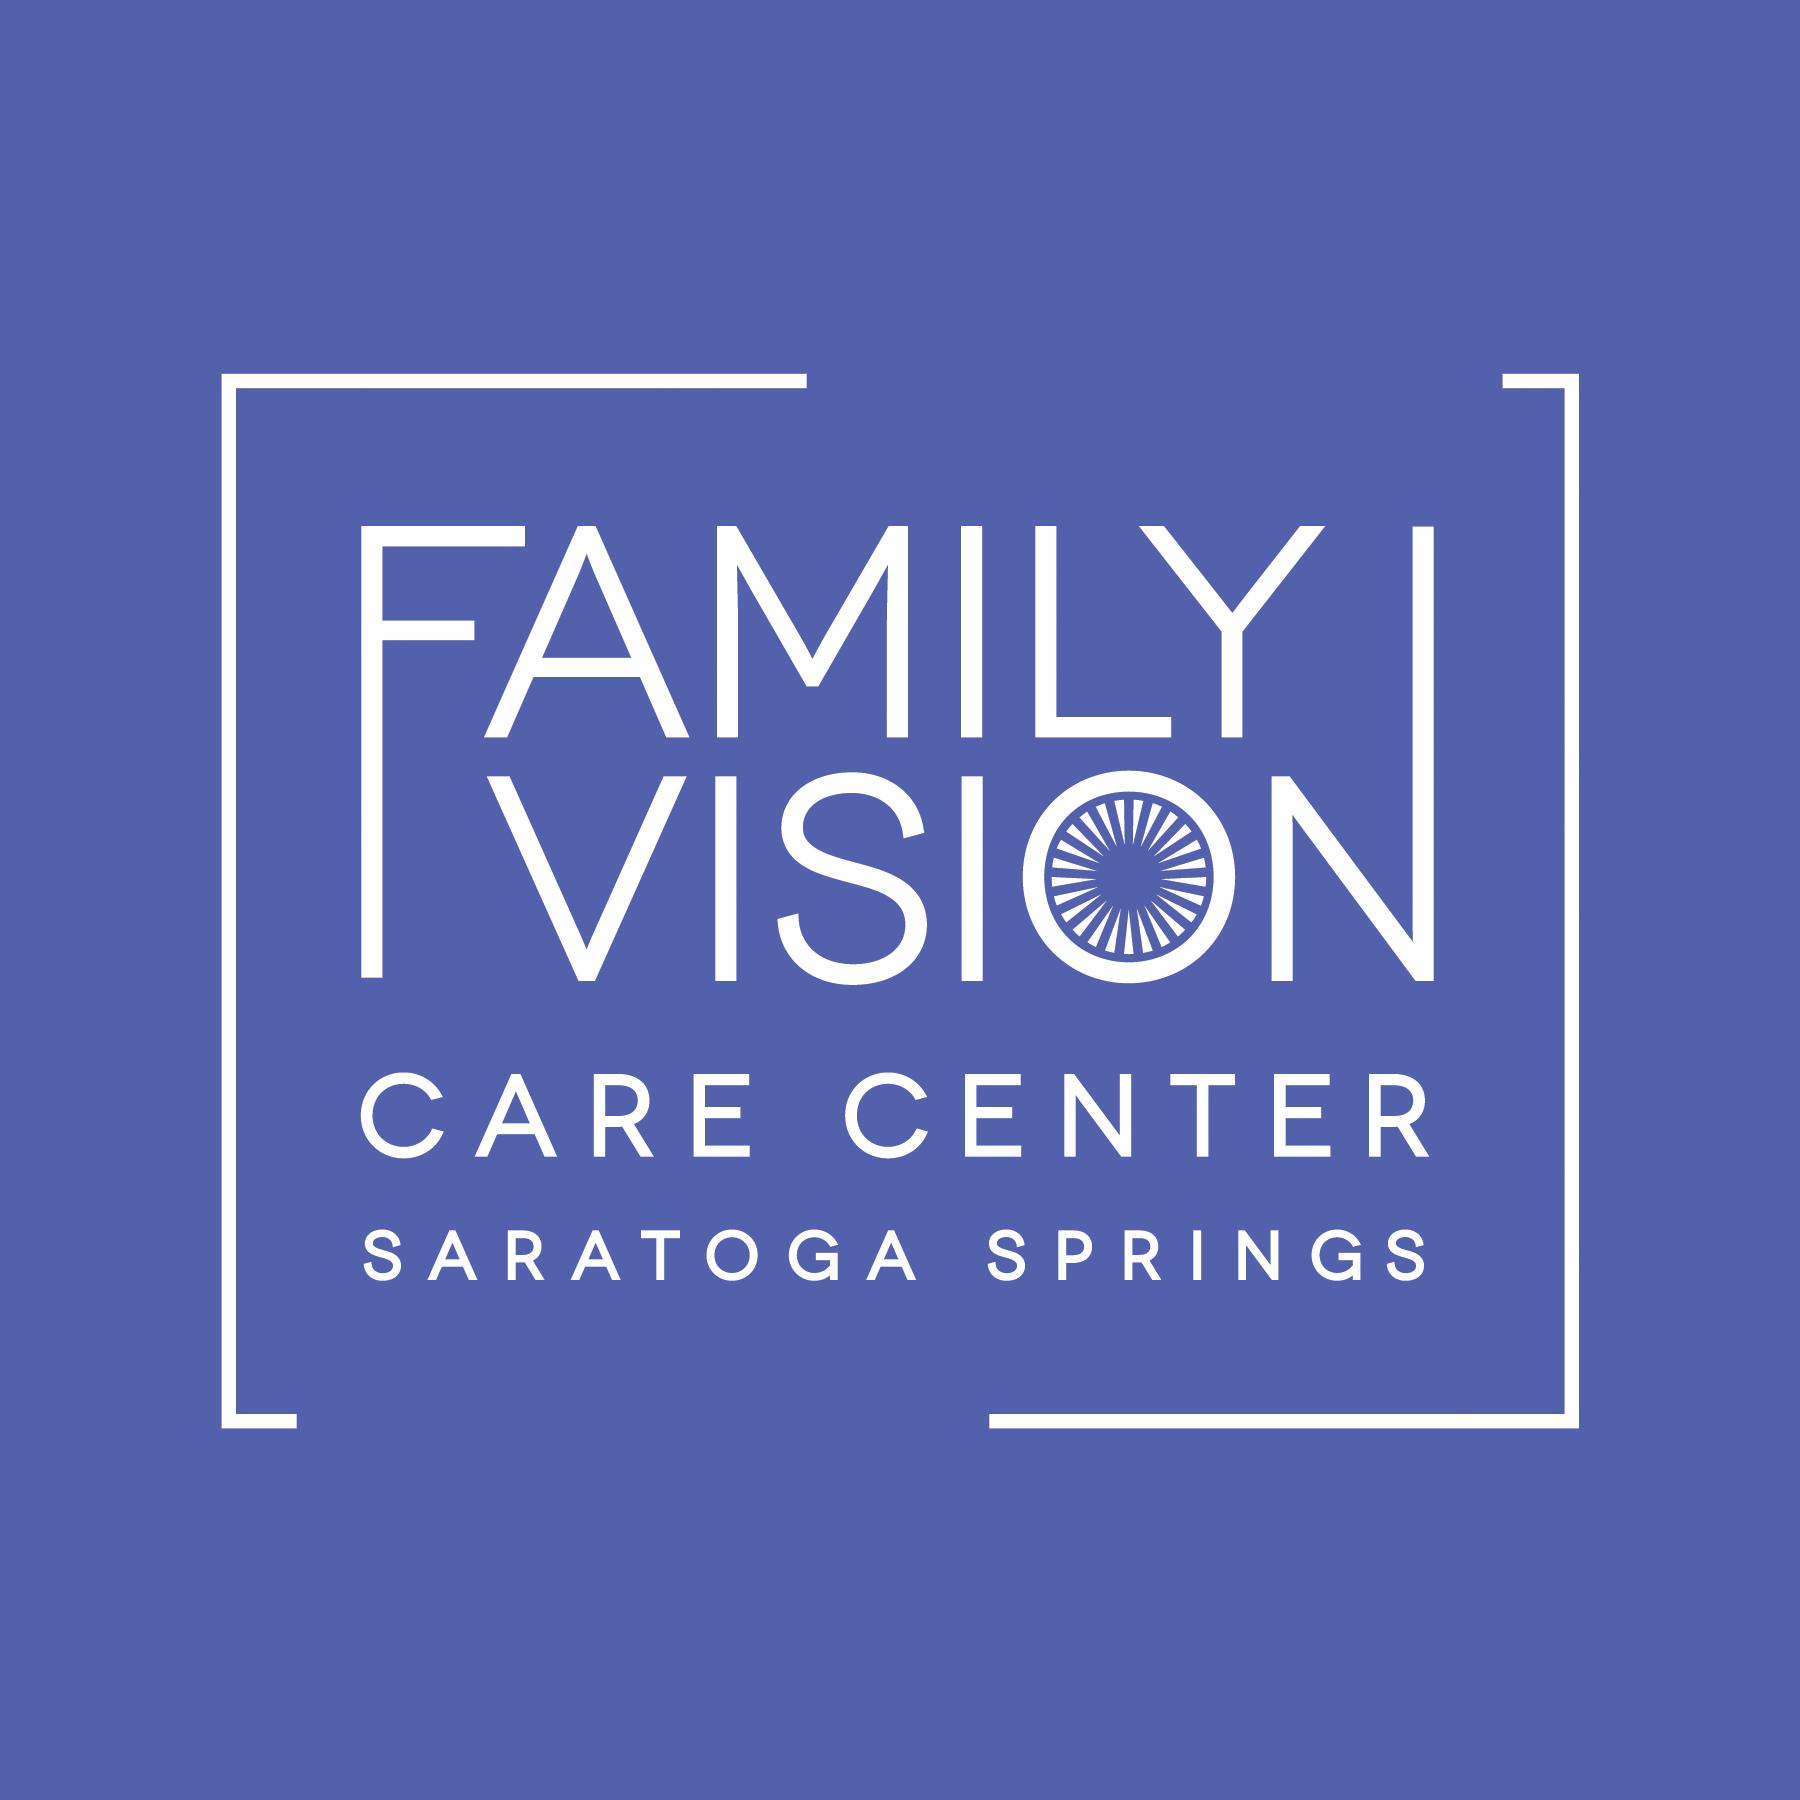 Family Vision Care Center